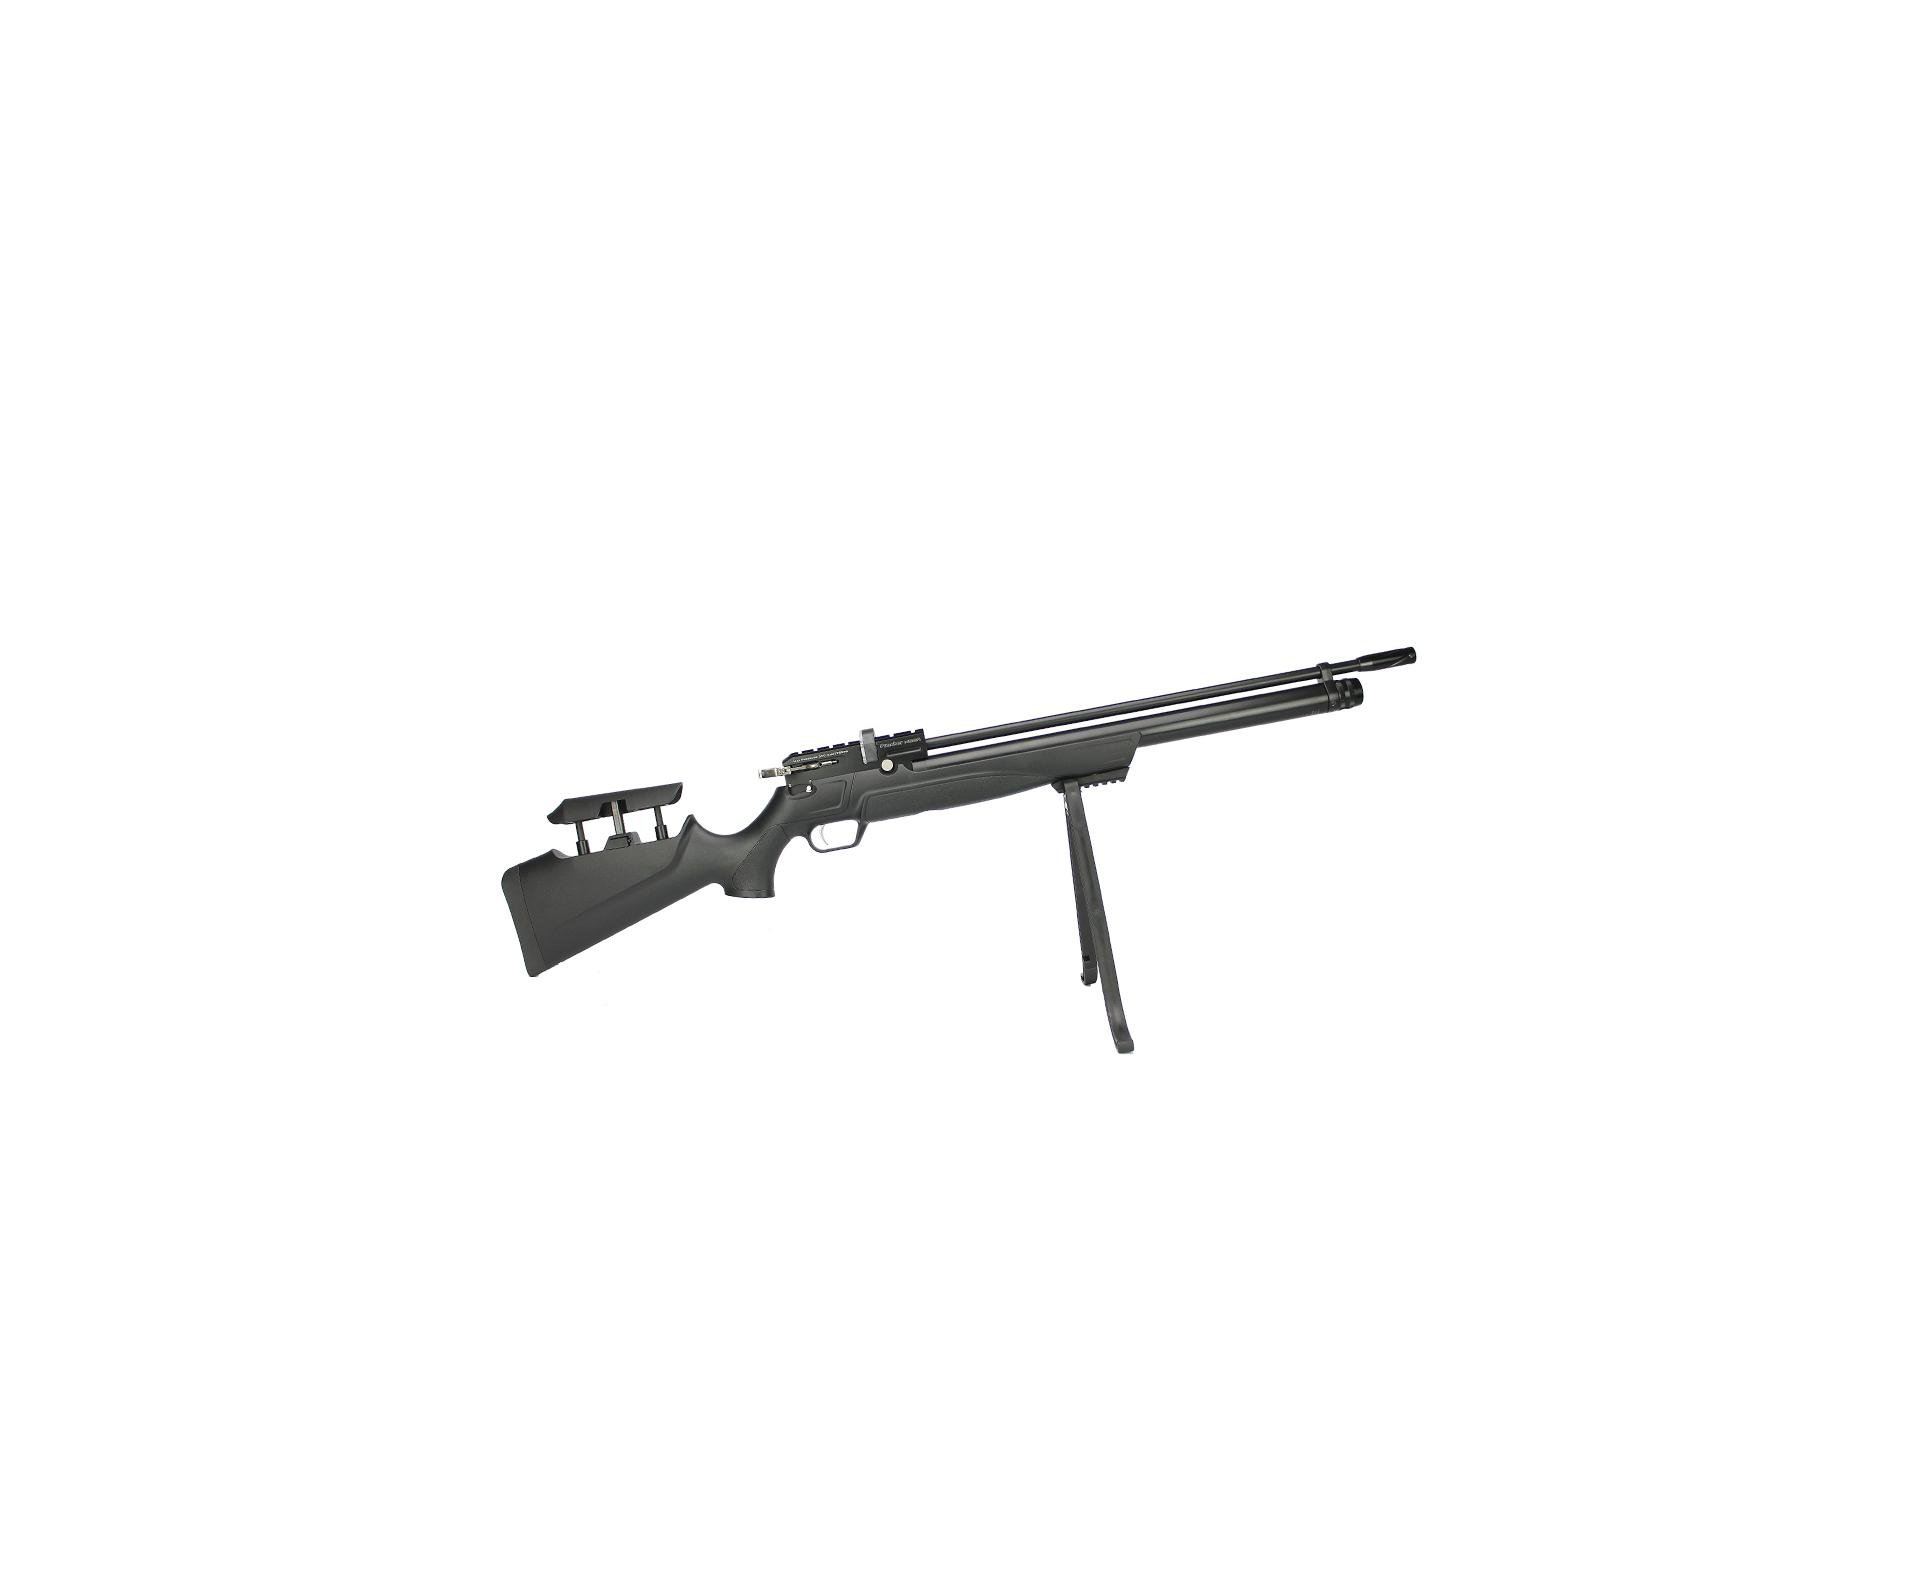 Carabina De Pressão Pcp Puncher Mega S 6.35mm Kral Arms